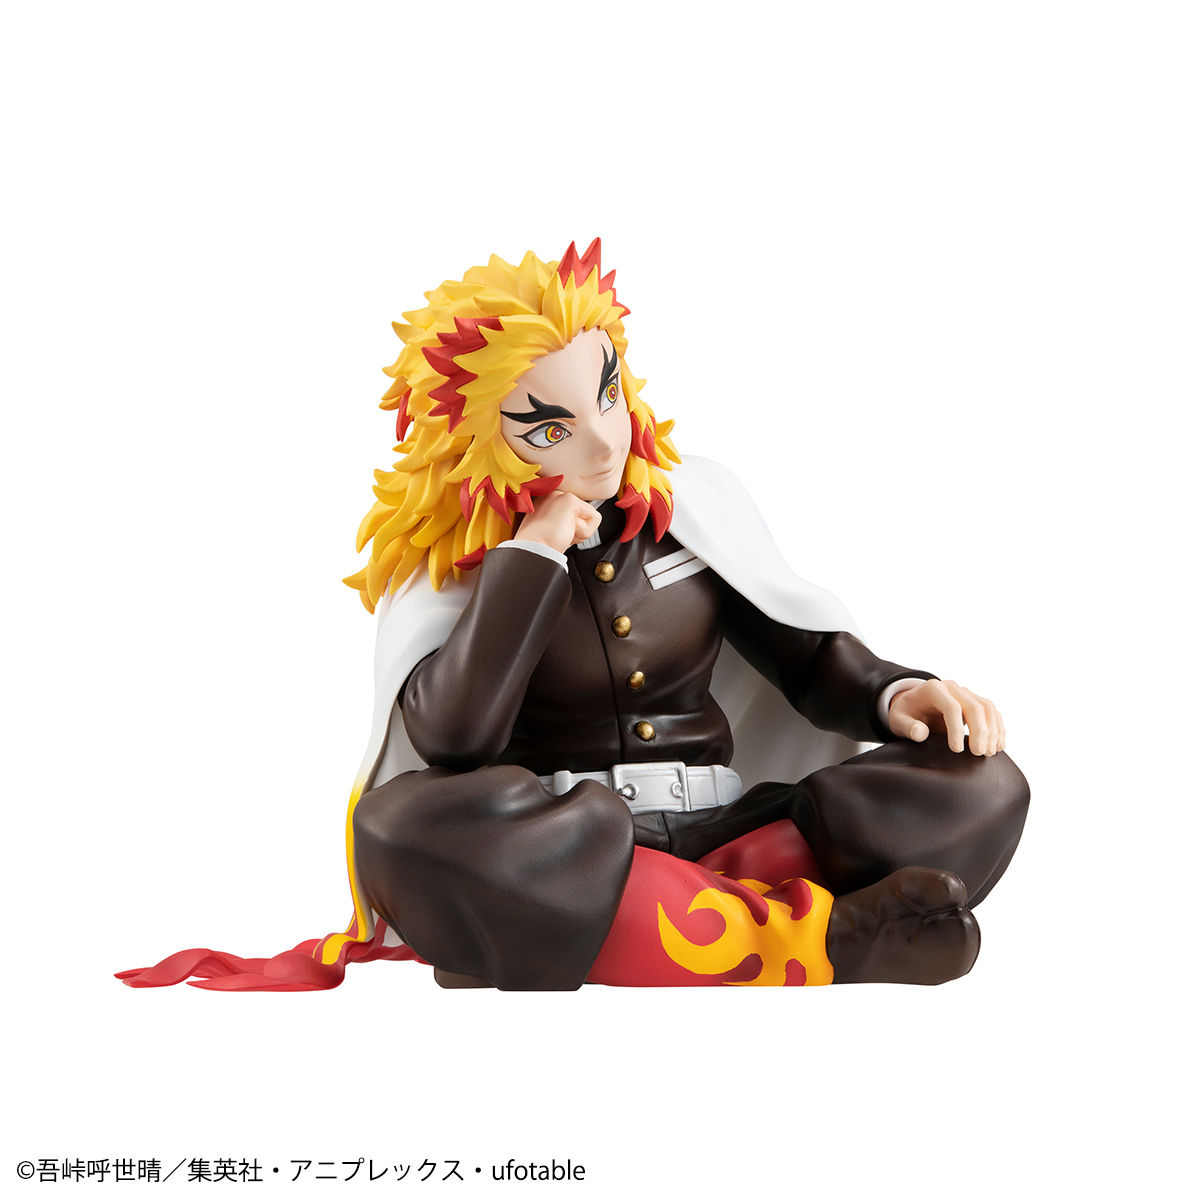 G.E.M.シリーズ『てのひら煉獄さん』鬼滅の刃 完成品フィギュア-005